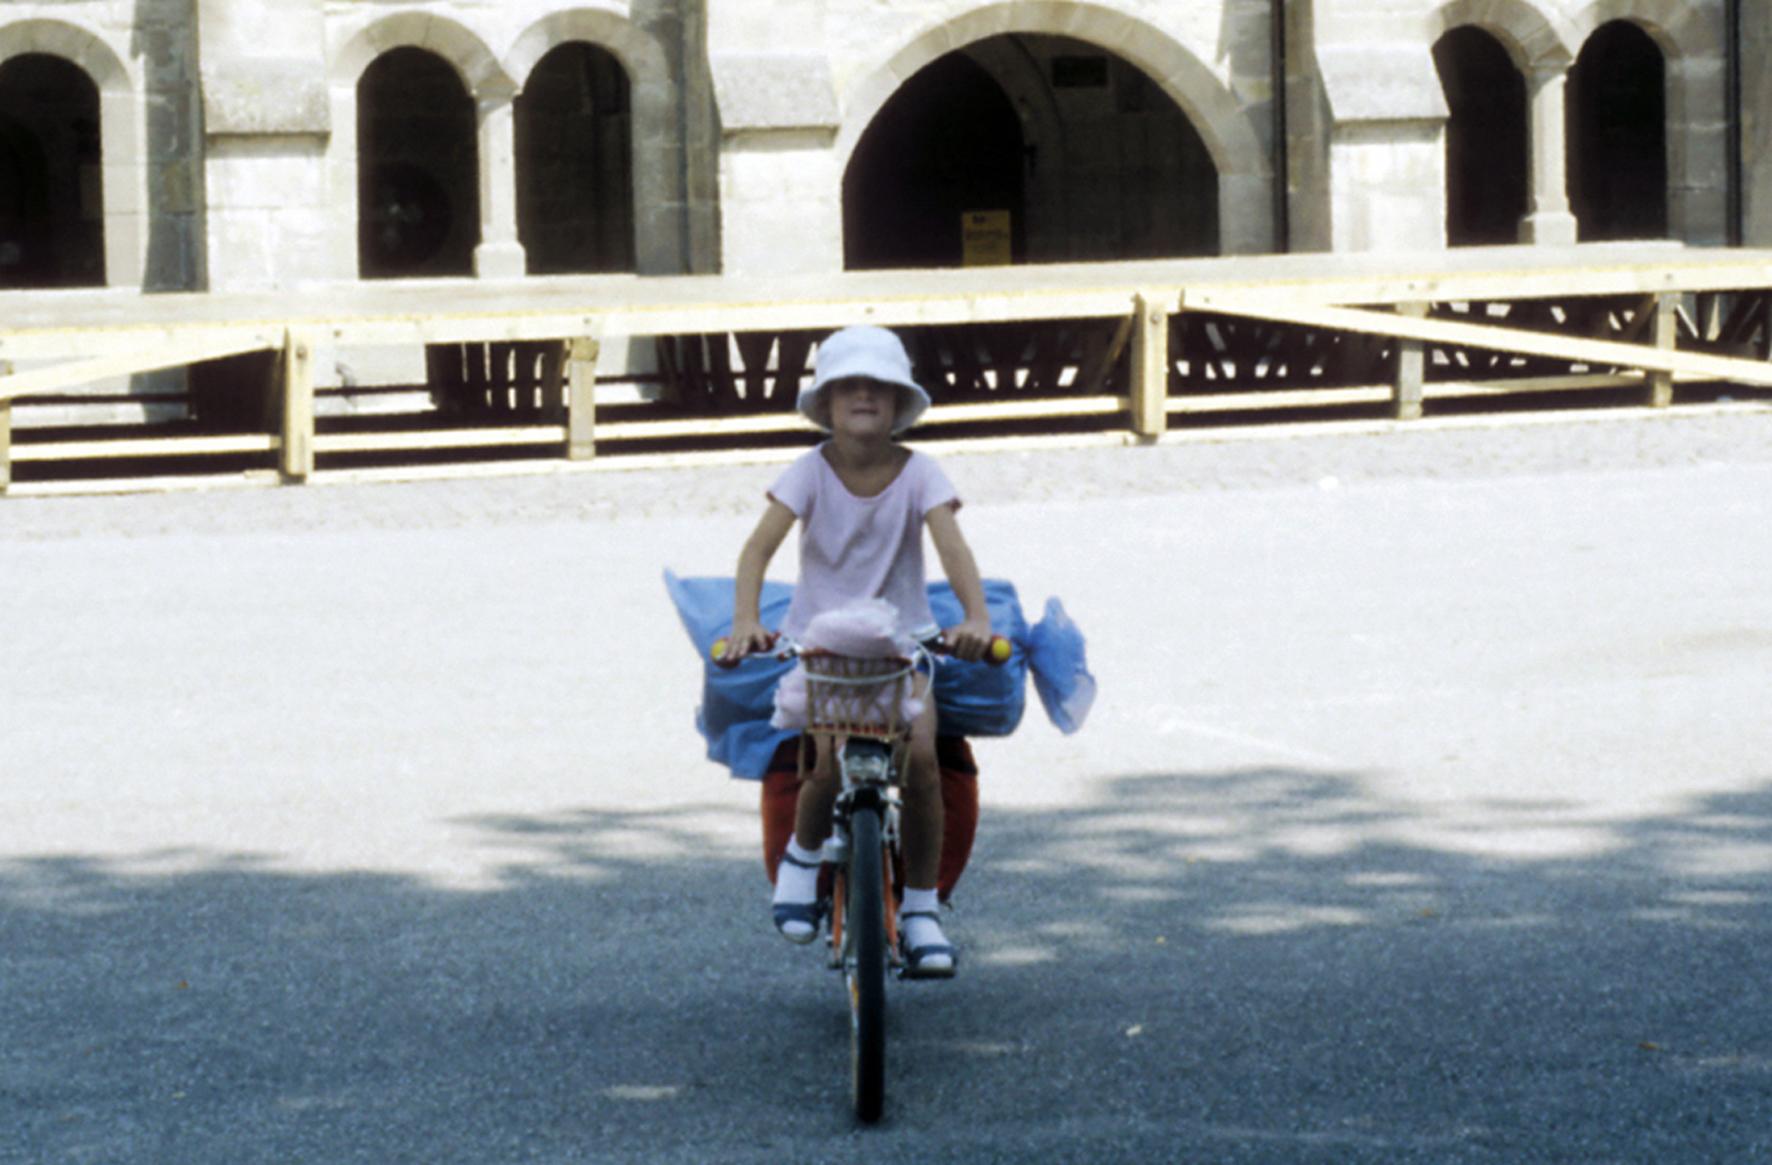 1986_046_Radtour mit Boffels - Kopie